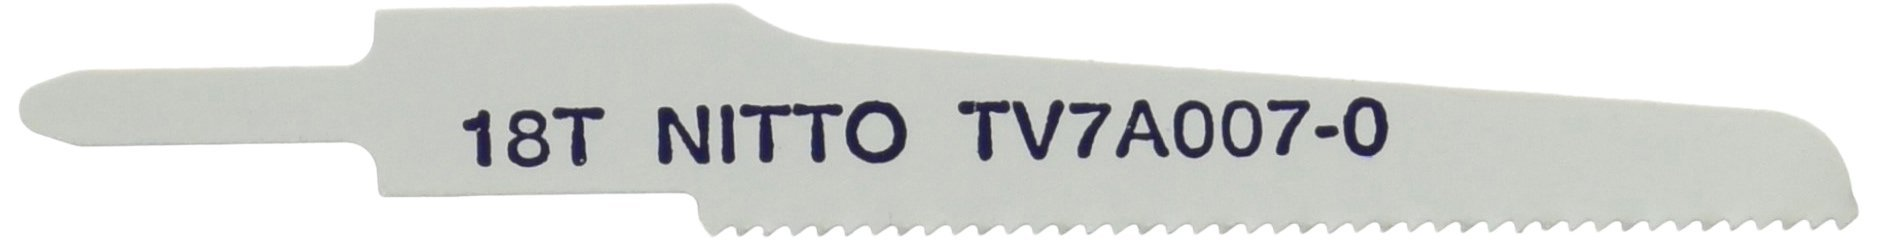 Nitto Kohki TV7A007-0 Bi-Metal Saw Blades for SSW-110 Super Saw, 18 TPI (Pack of 5)